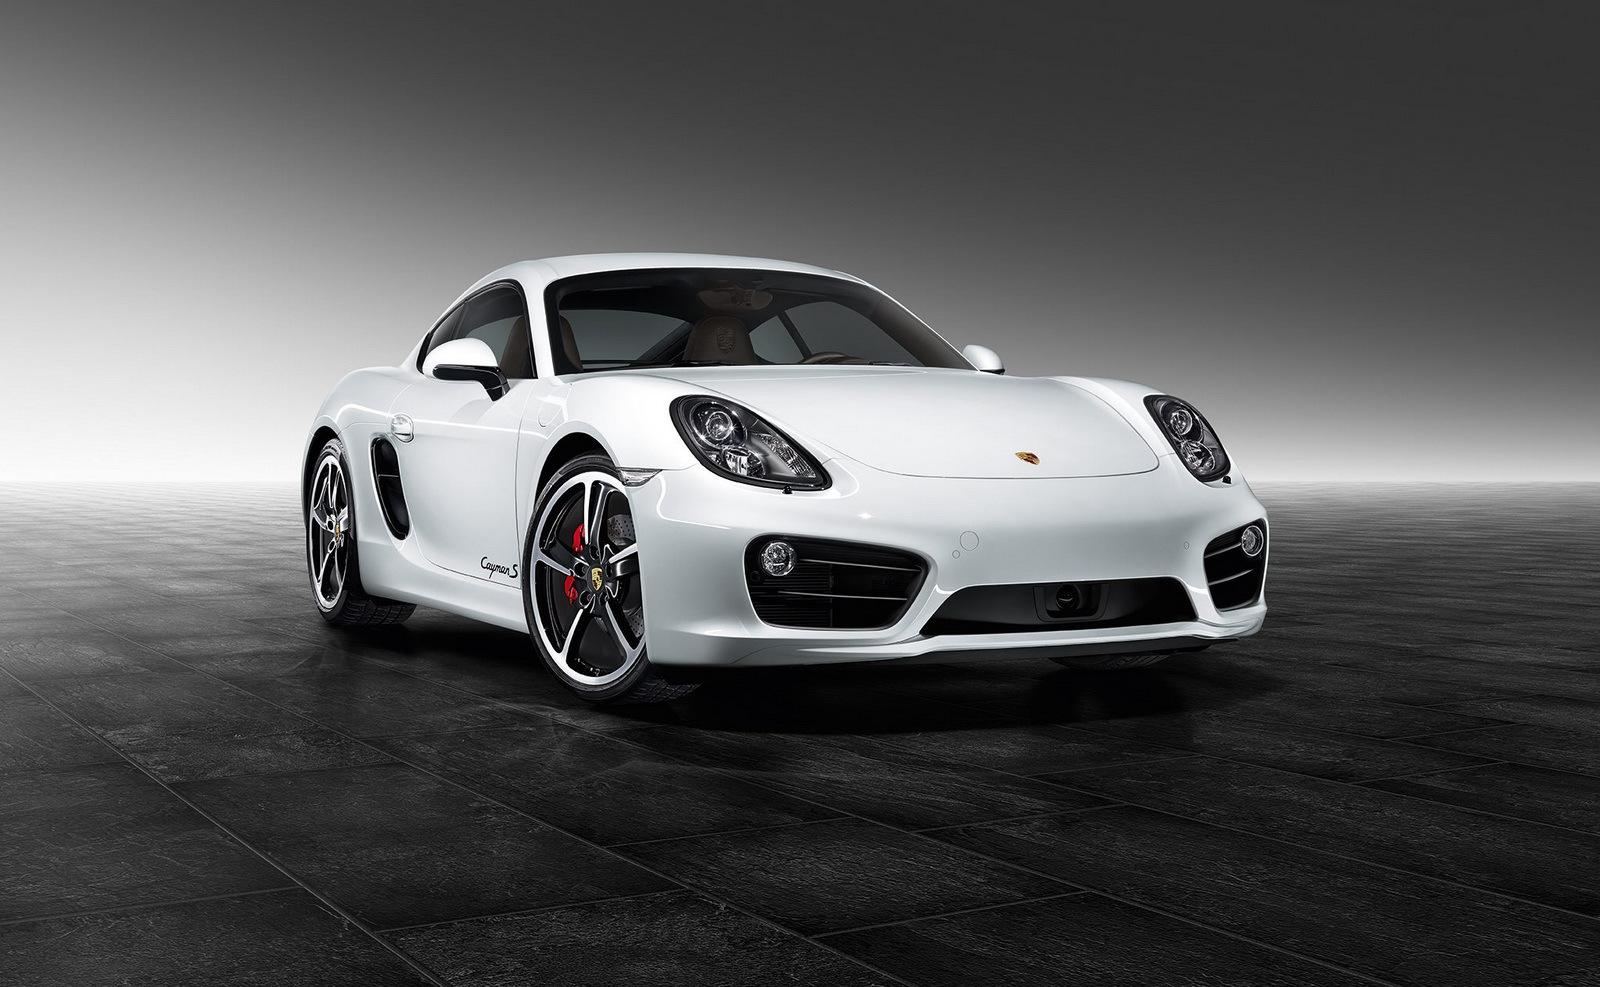 Porsche Exclusive Cayman S 2015 01